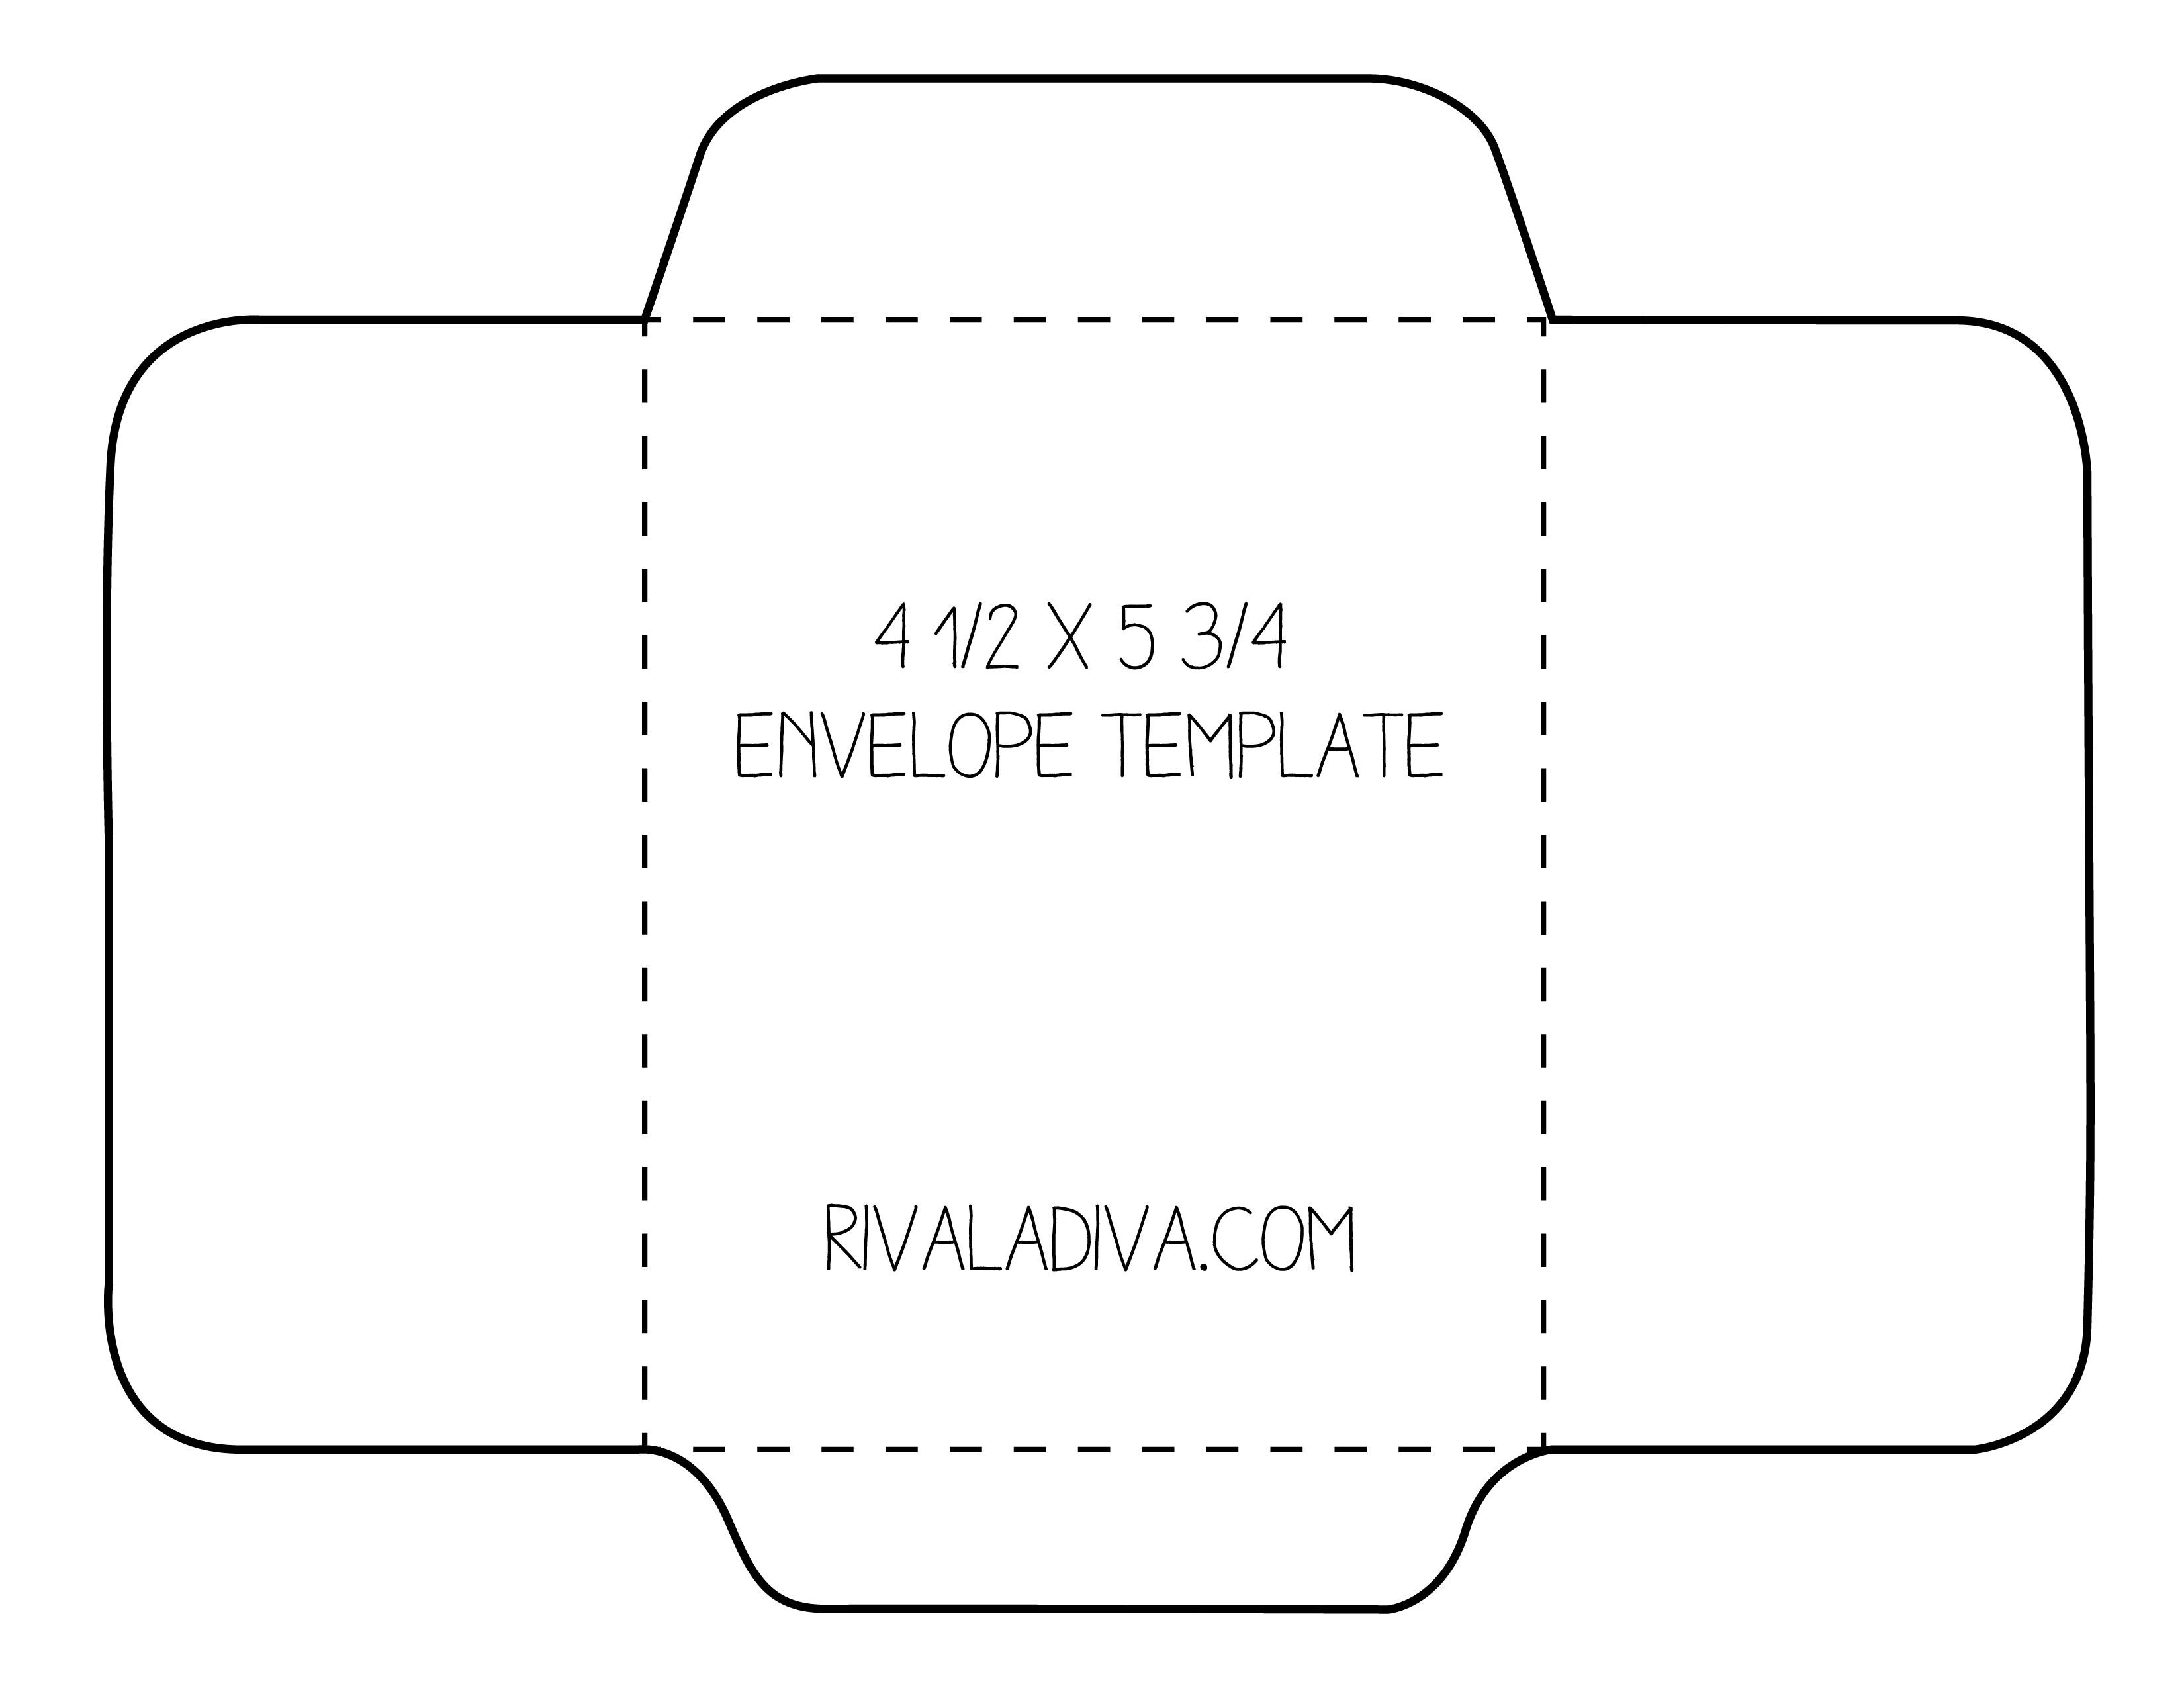 Envelope Template   Envelope Template For 8.5 X 11 Paper Diy - Free Printable Gift Card Envelope Template